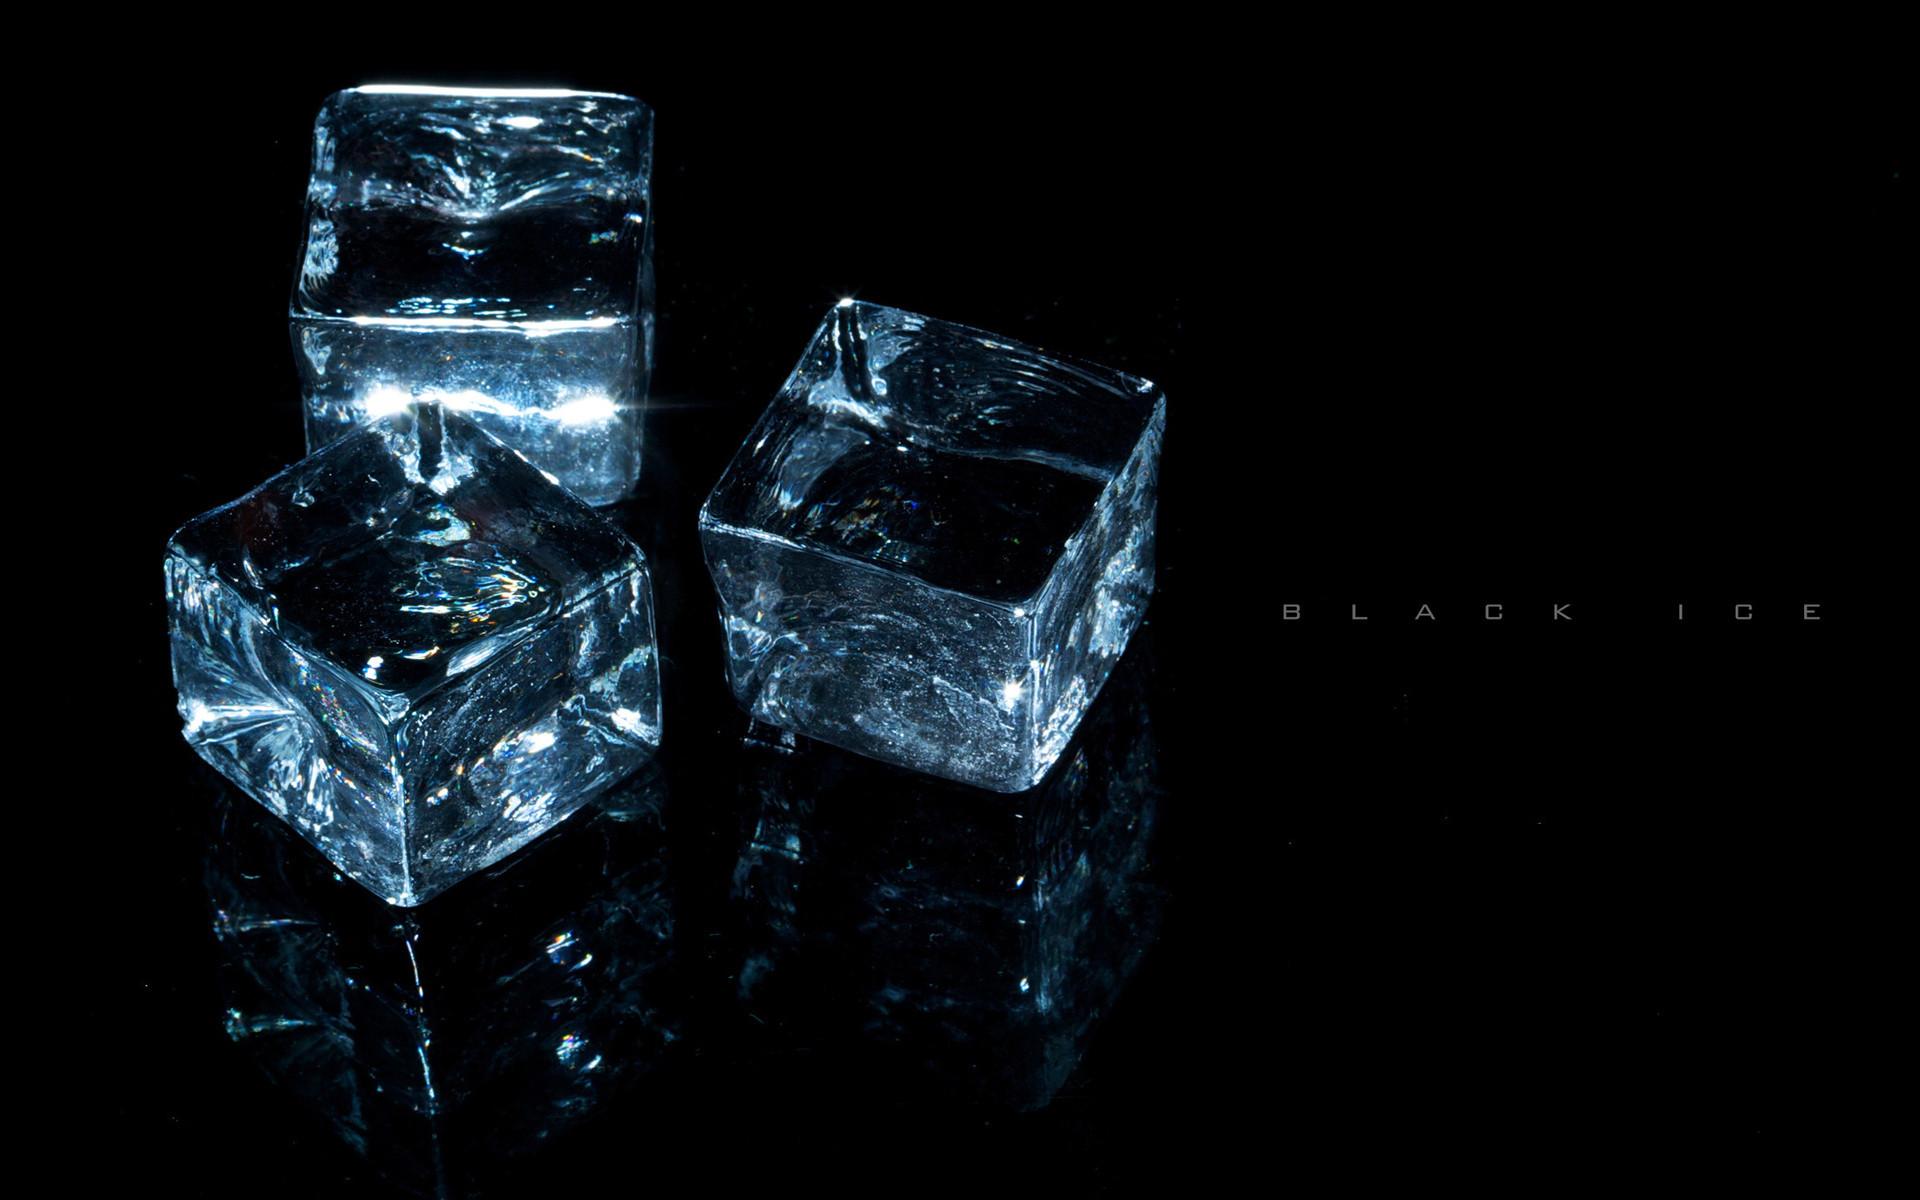 Black Ice Cubes Wallpaper